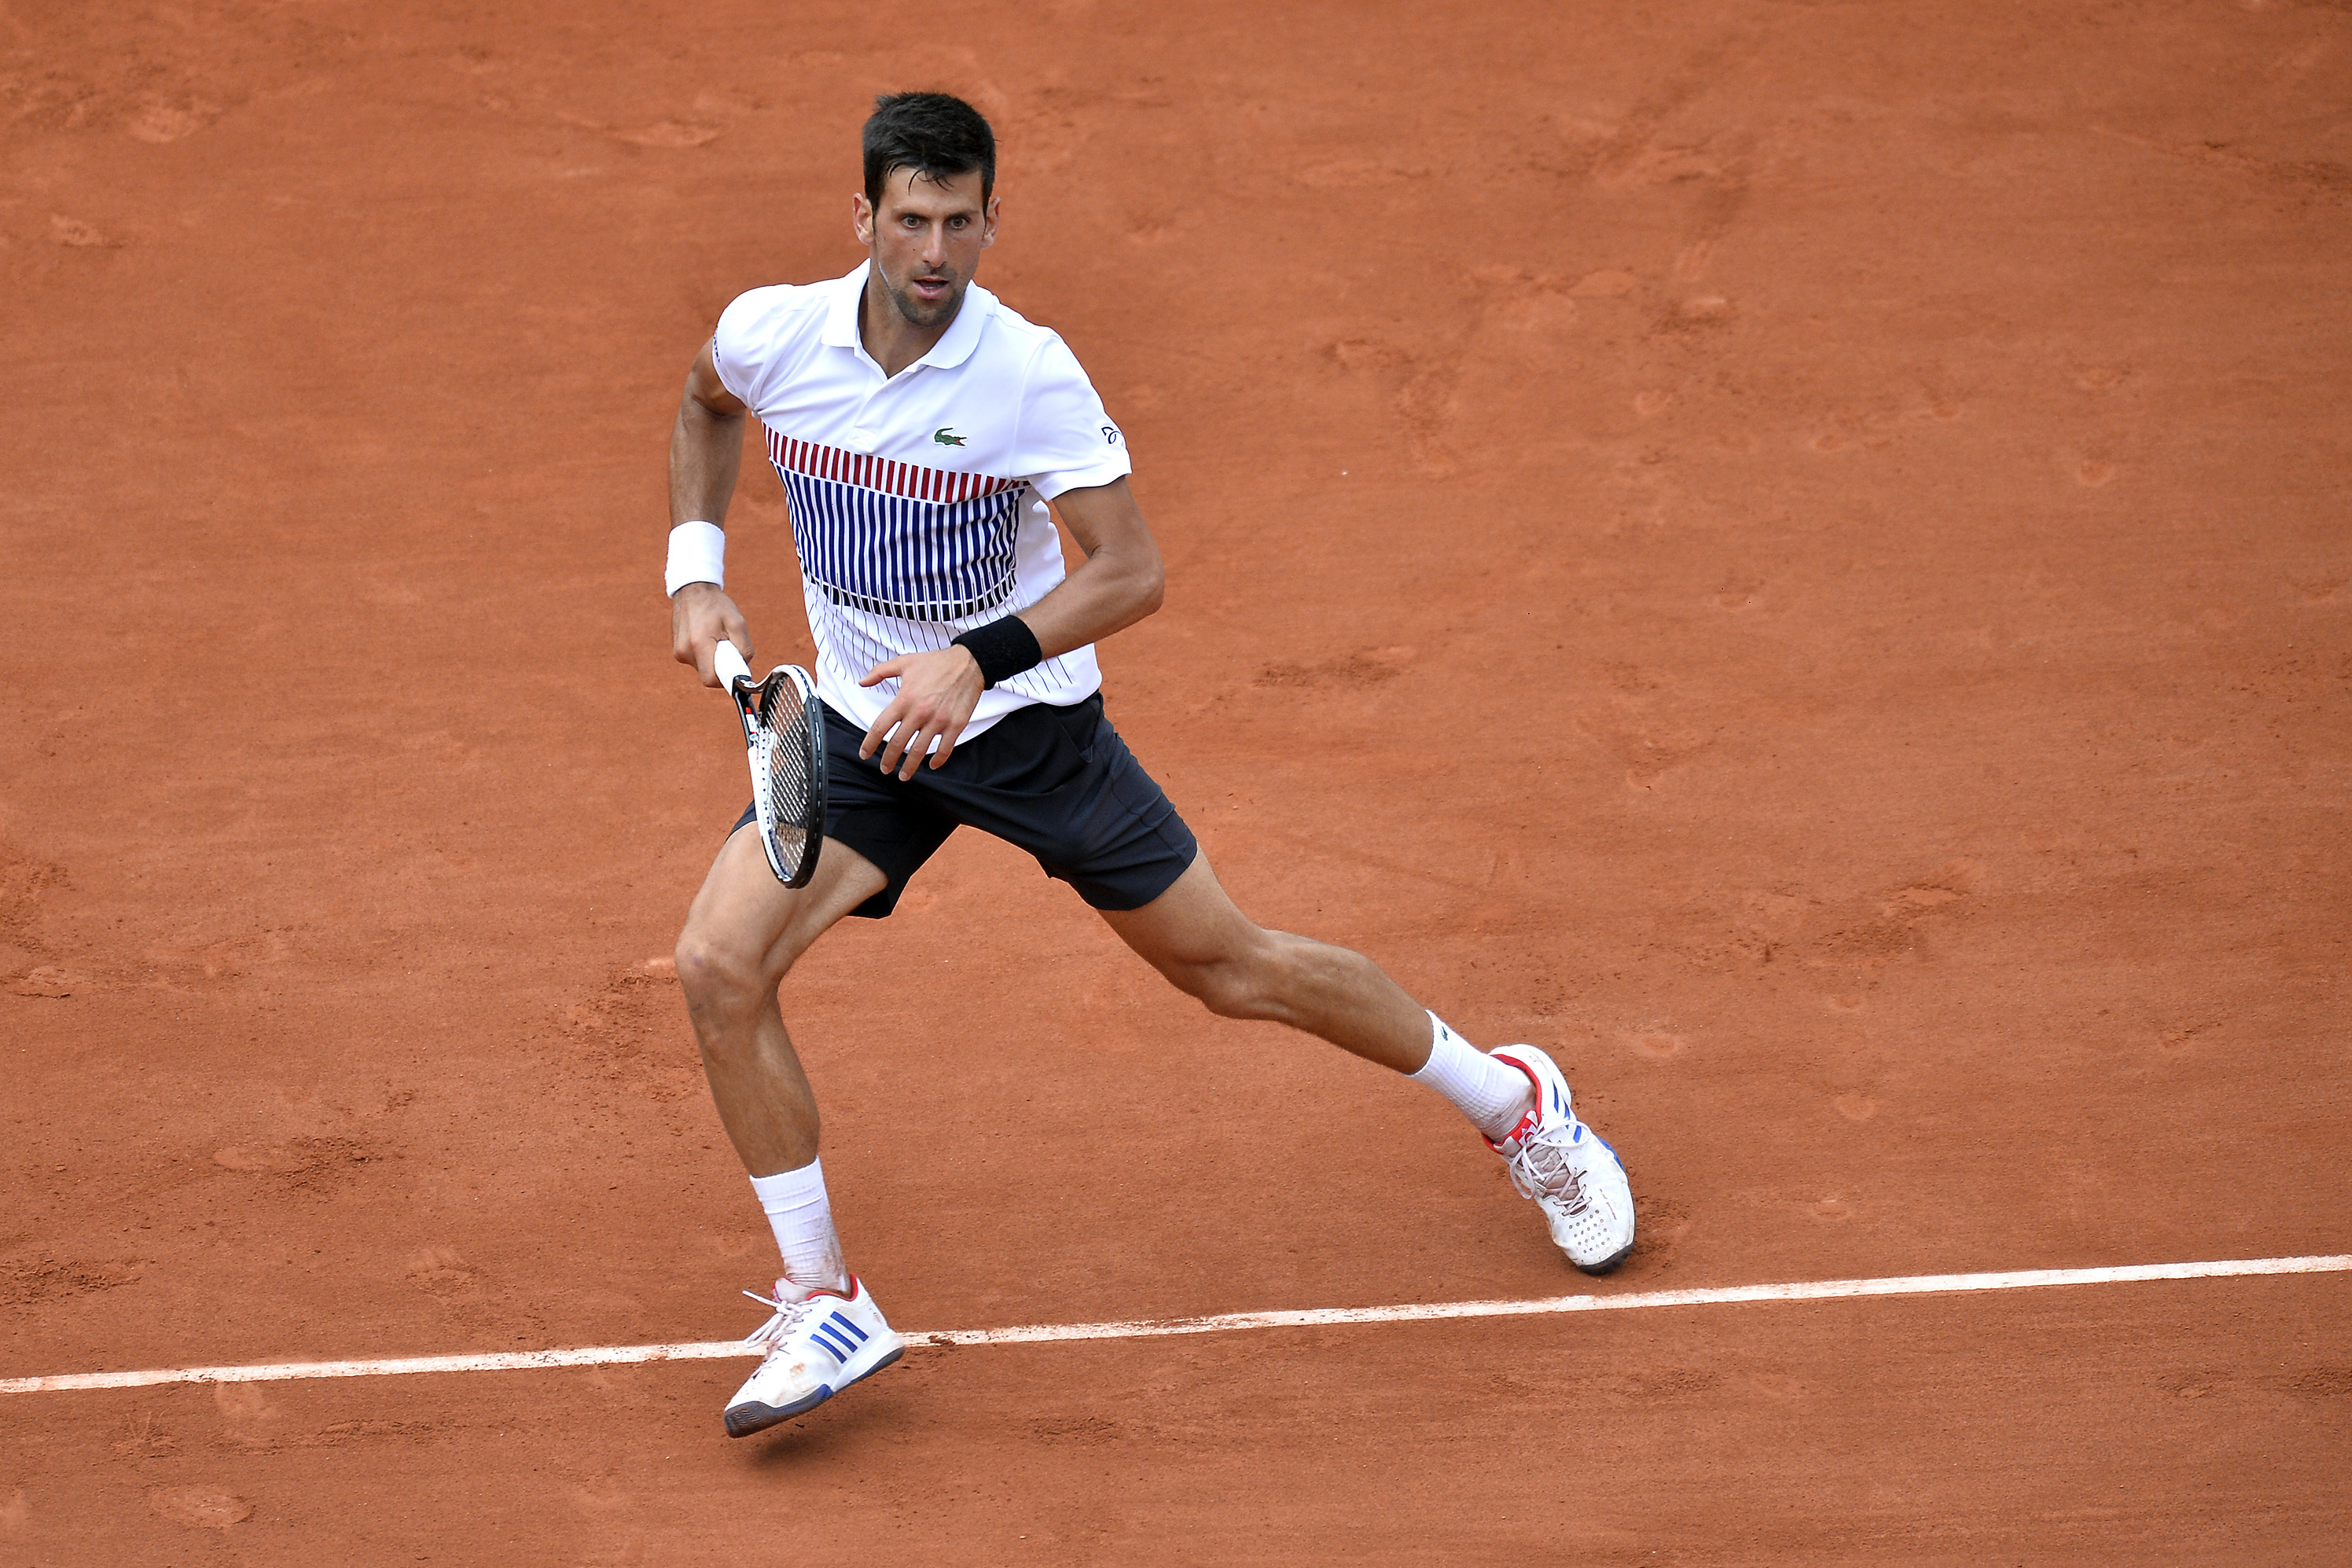 French Open 2017 Novak Djokovic Thriller Highlights Friday Roland Garros Play Bleacher Report Latest News Videos And Highlights